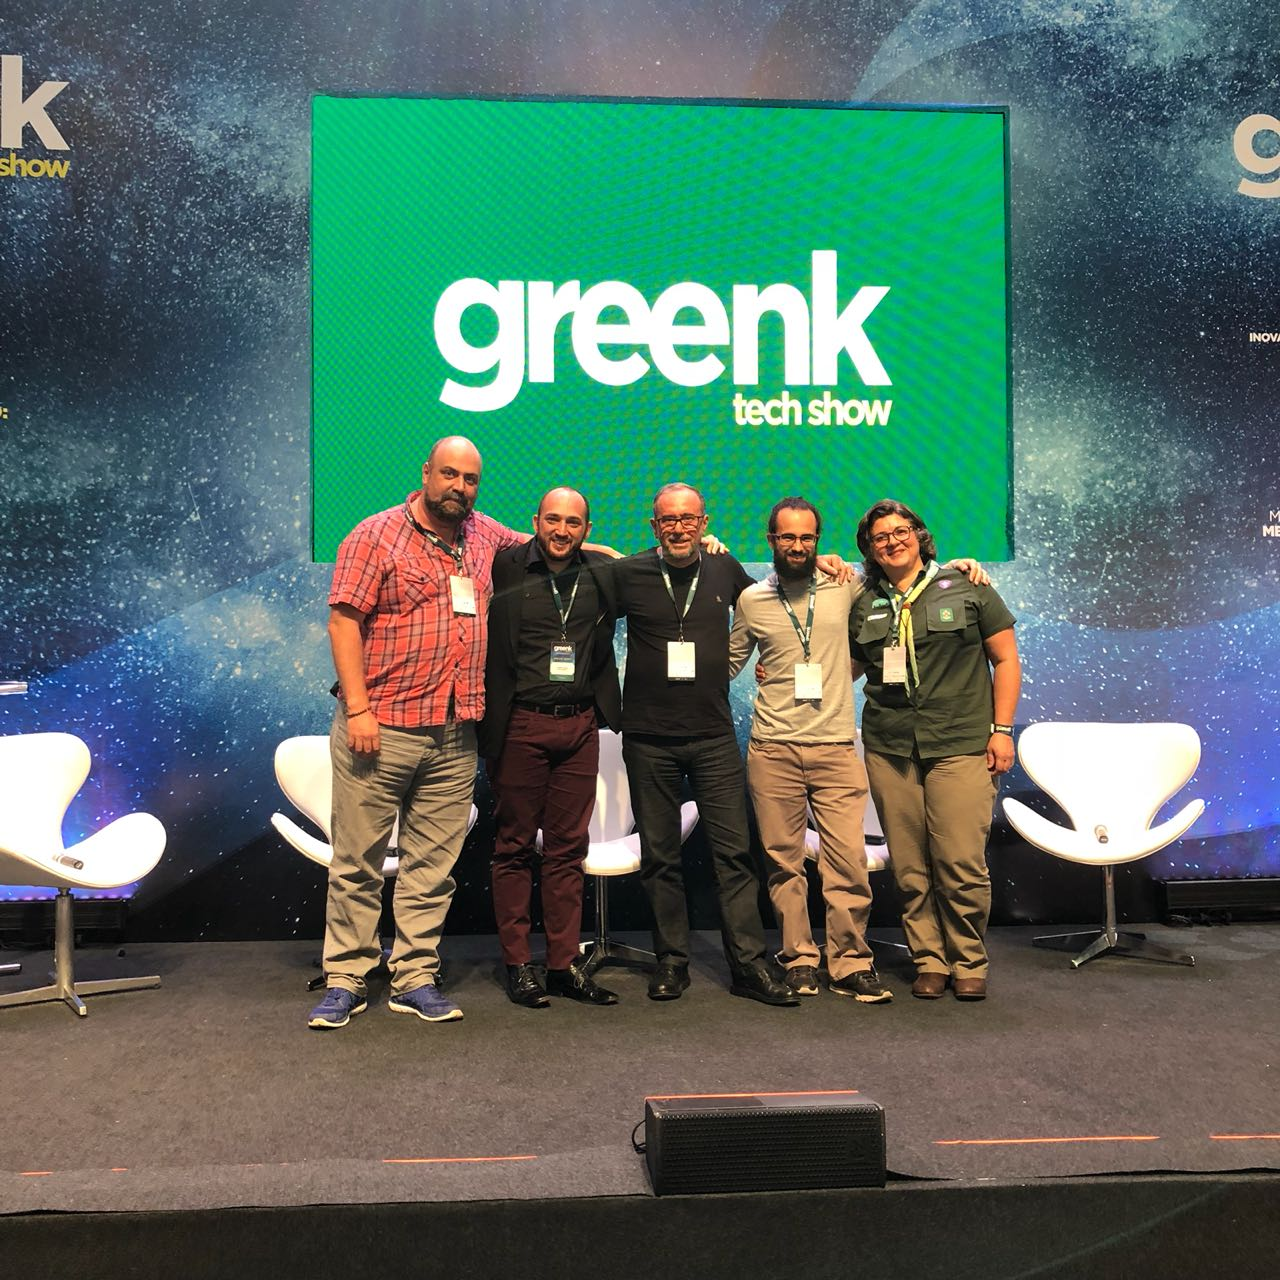 Bia Reali participa de bate-papo no Greenk Tech Show